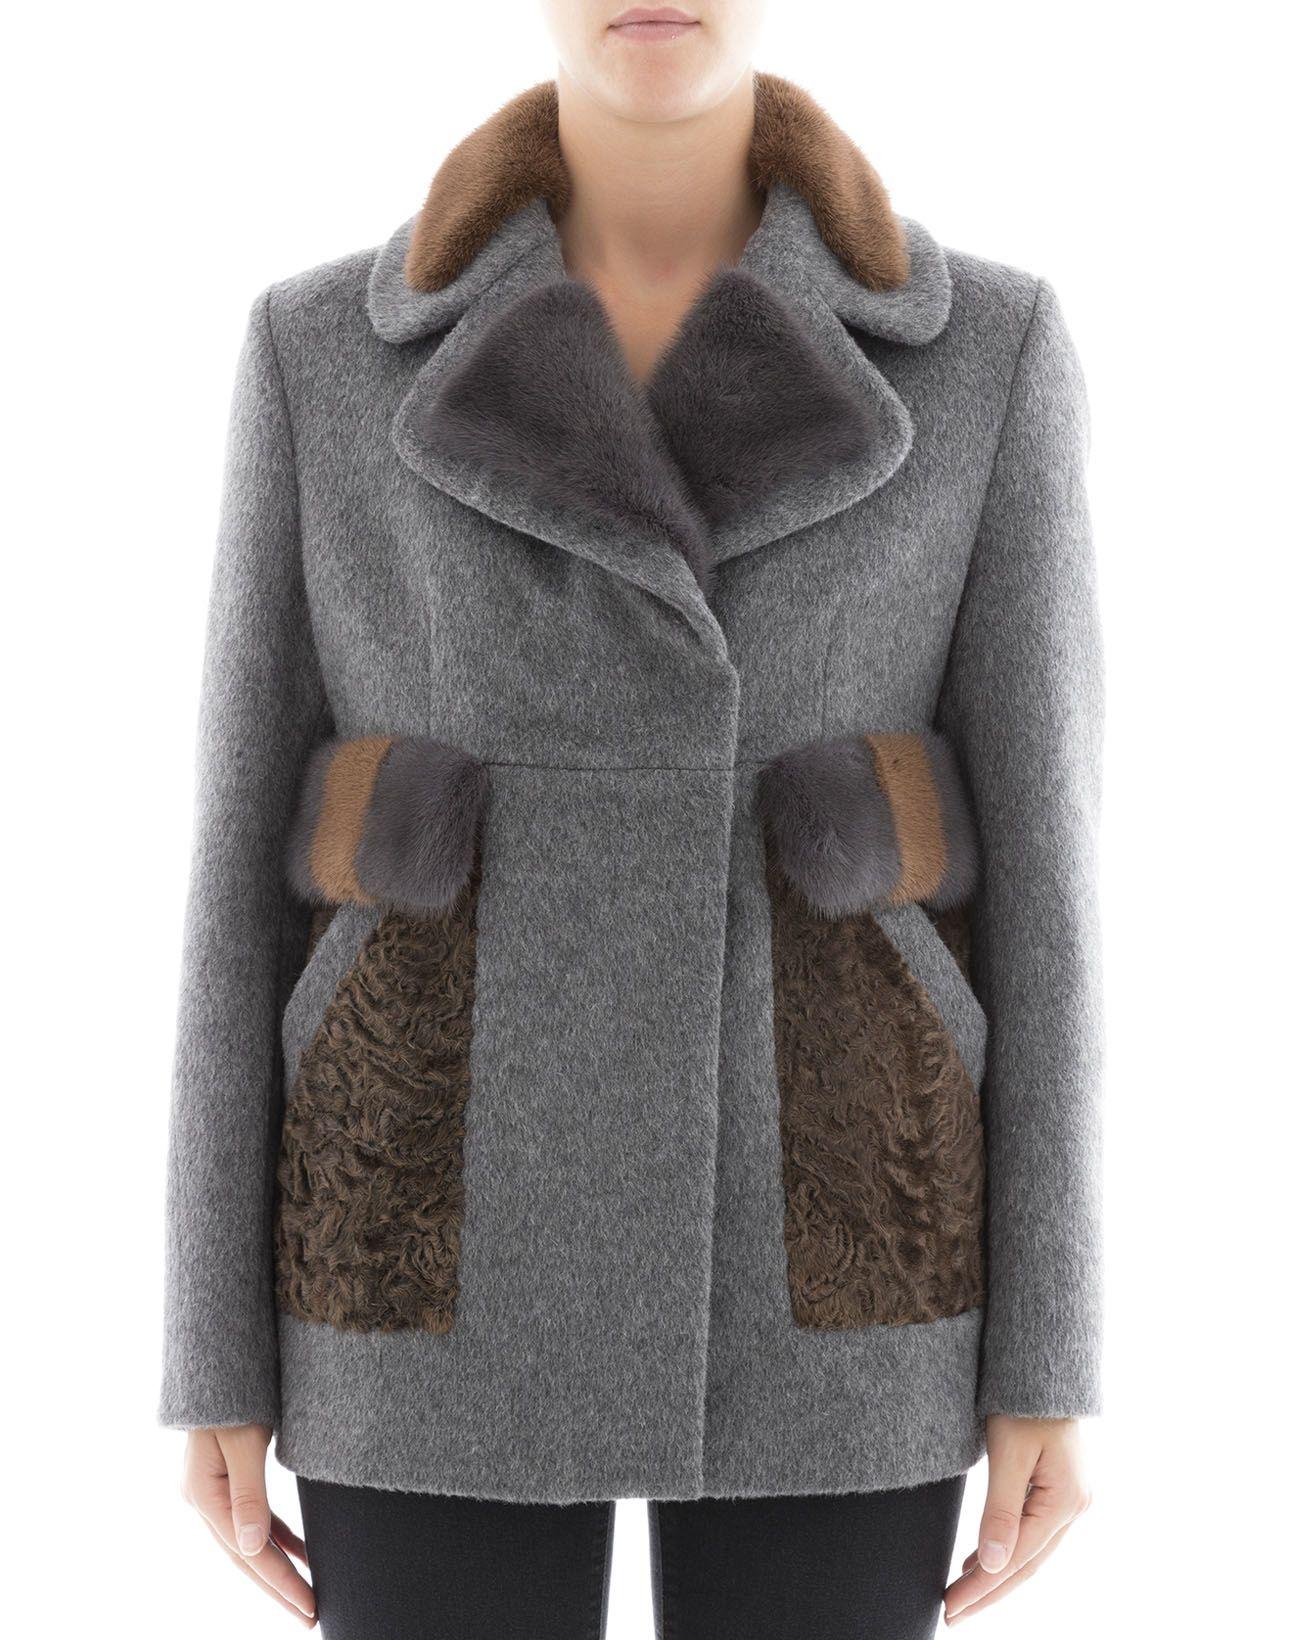 Grey Alpaca Coat